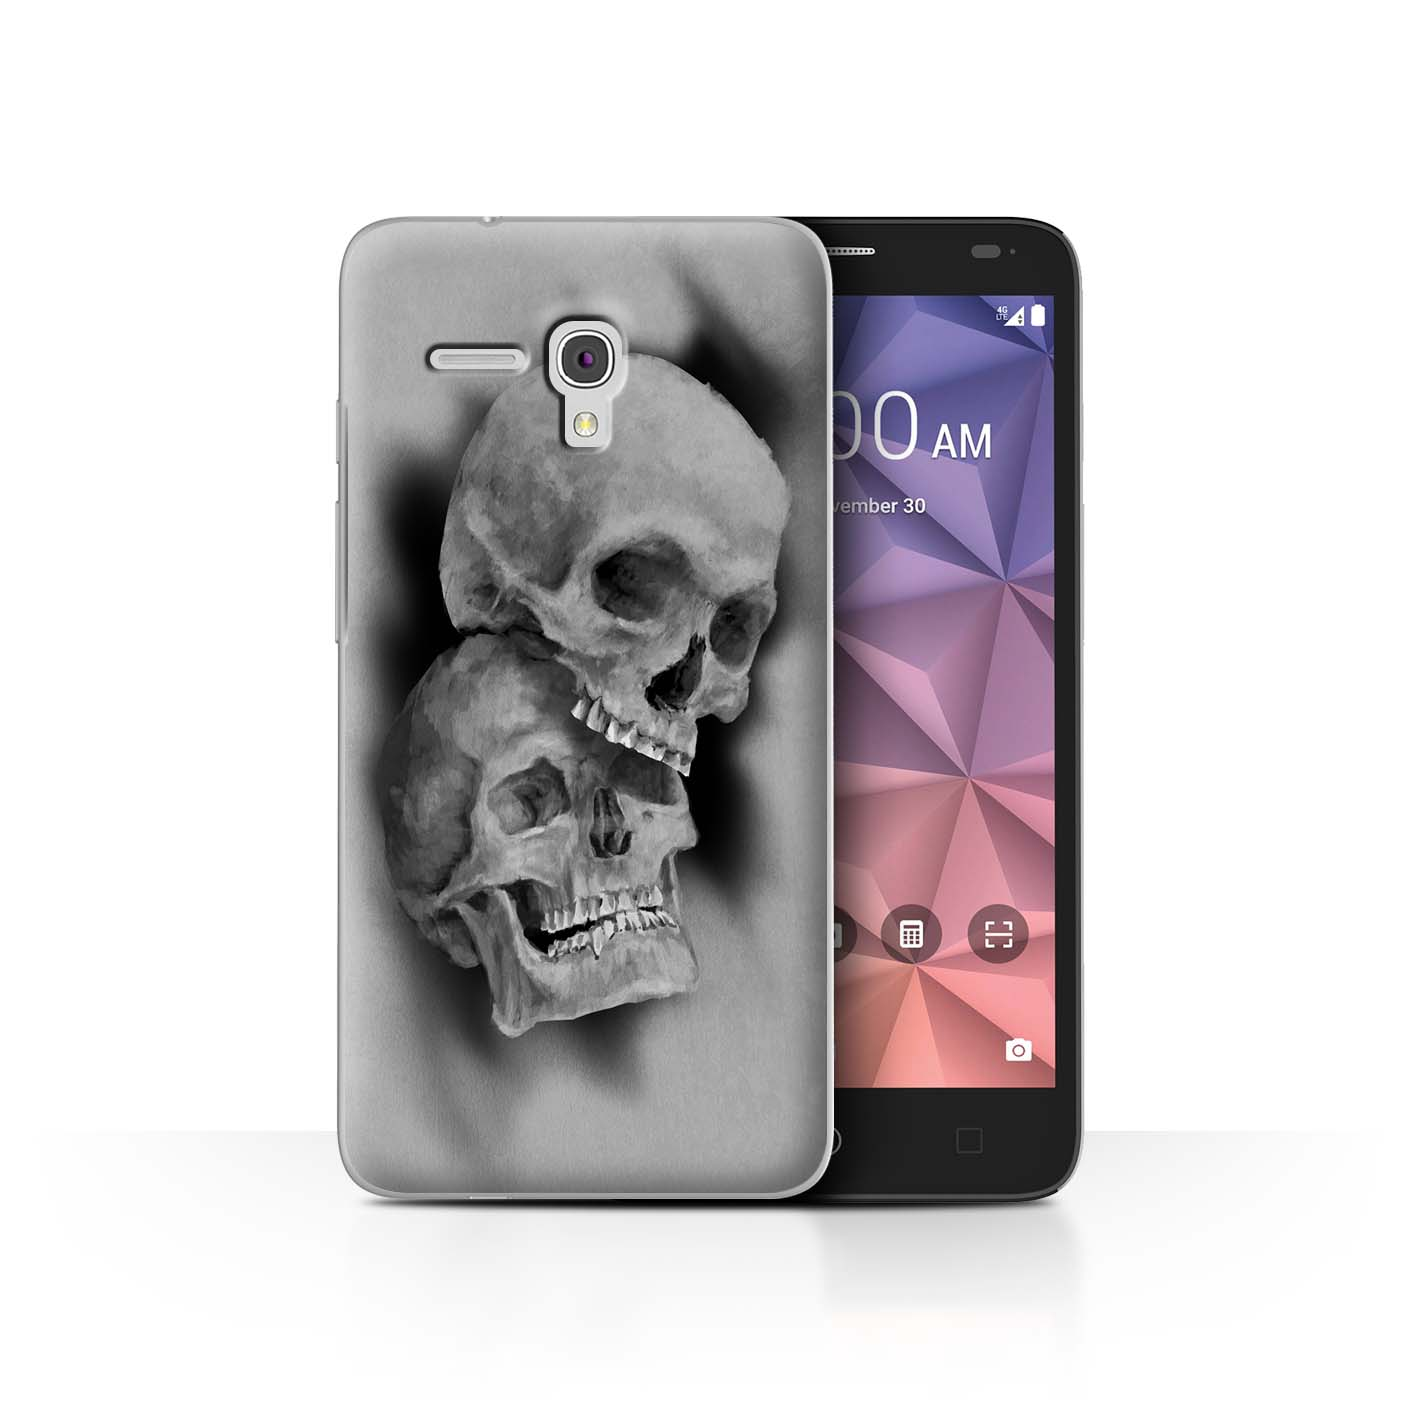 STUFF4-Back-Case-Cover-Skin-for-Alcatel-Fierce-XL-Skull-Art-Sketch